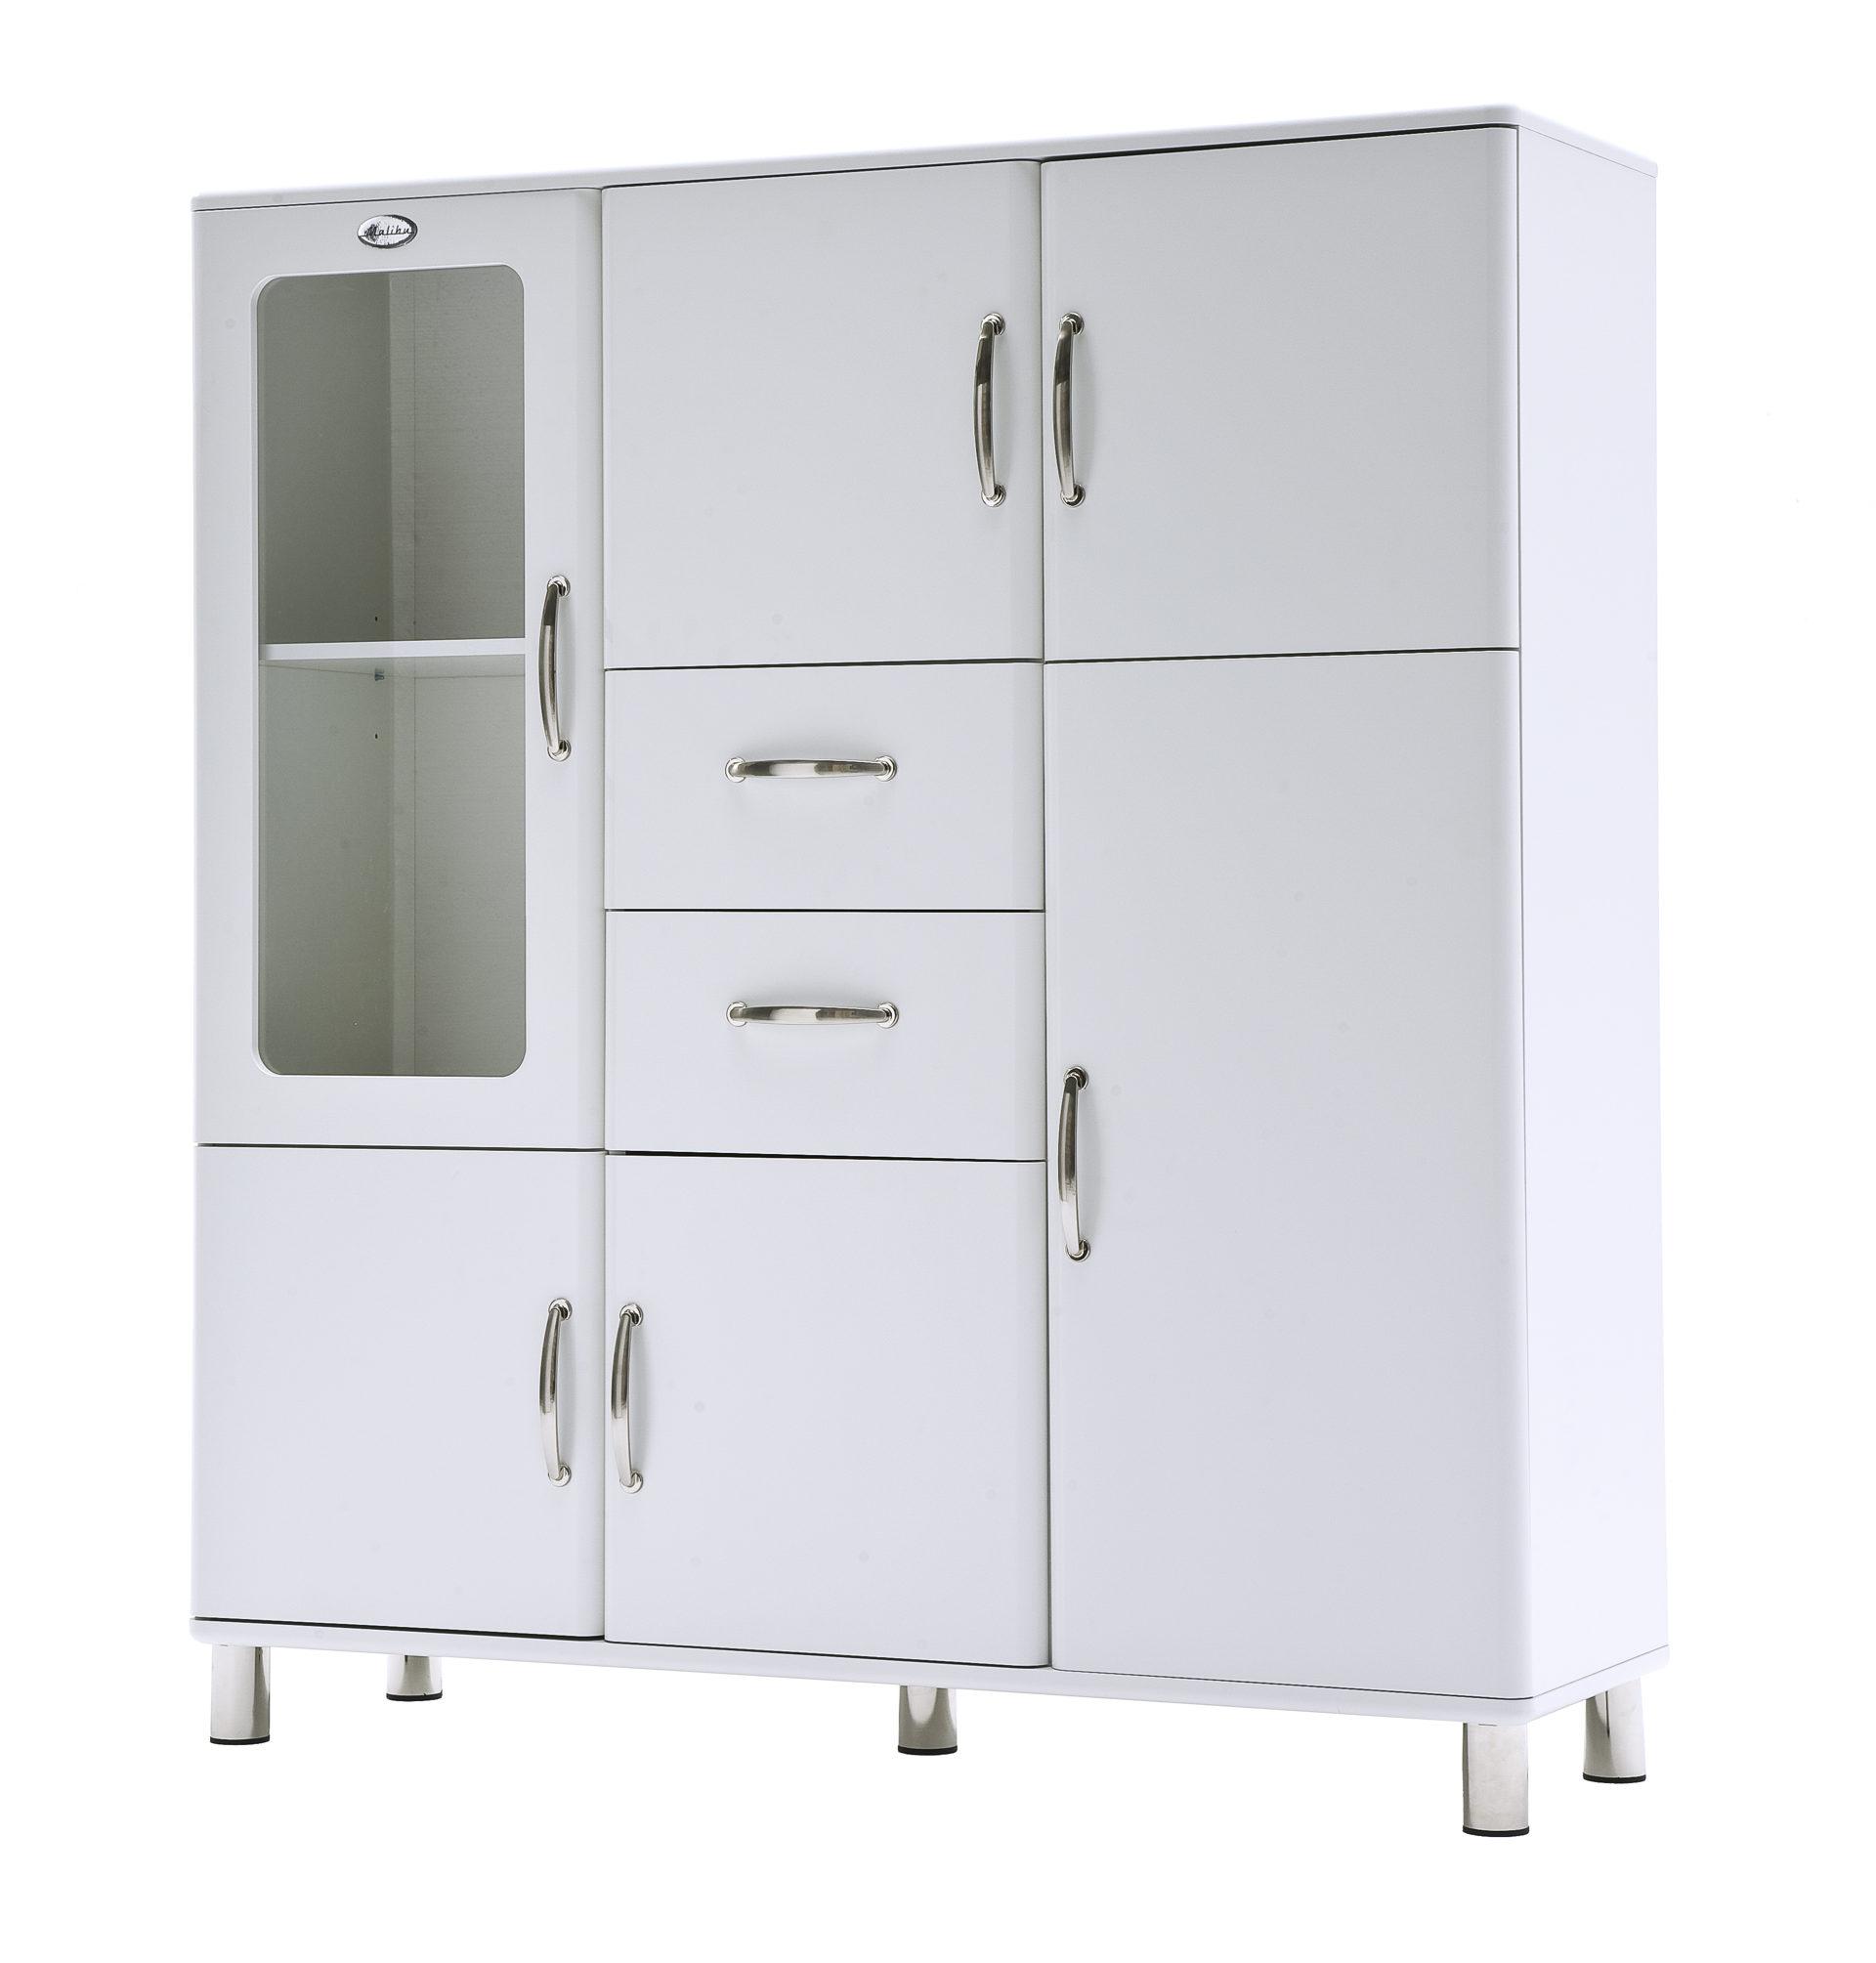 Büroschrank weiß schubladen  Möbel Hugelmann Lahr | Markenshops | Malibu | Tenzo Malibu Schrank ...